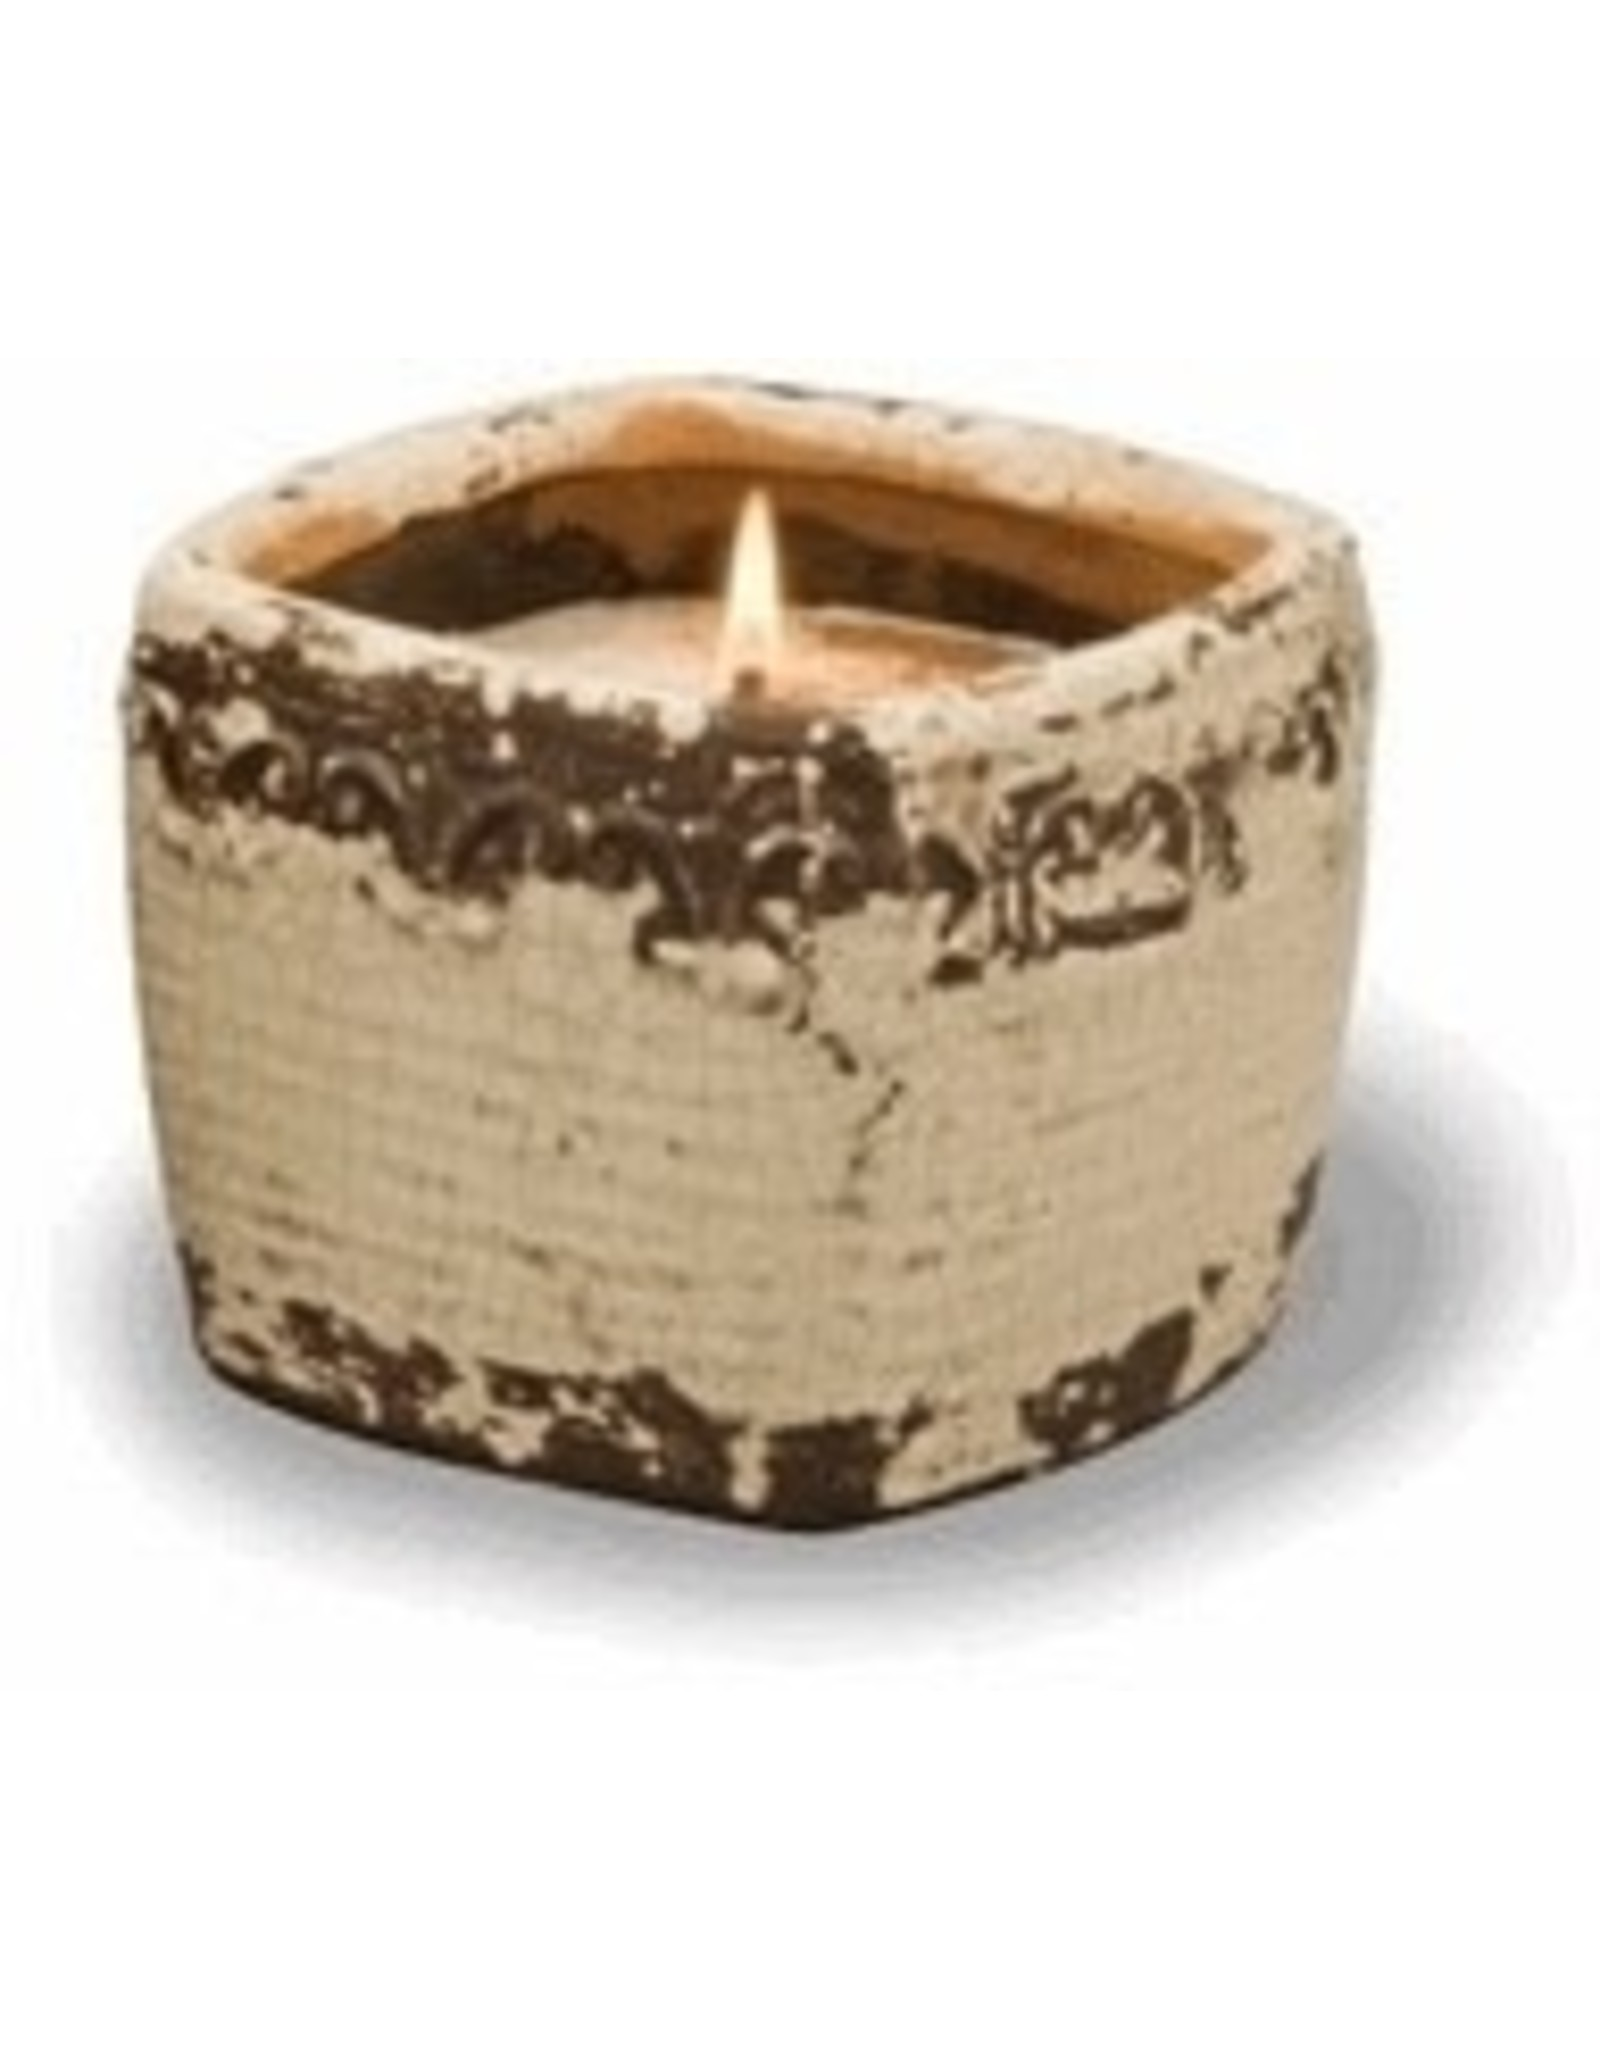 Swan Creek Candles Vintage Sq Pot Spiced Orange & Cinnamon